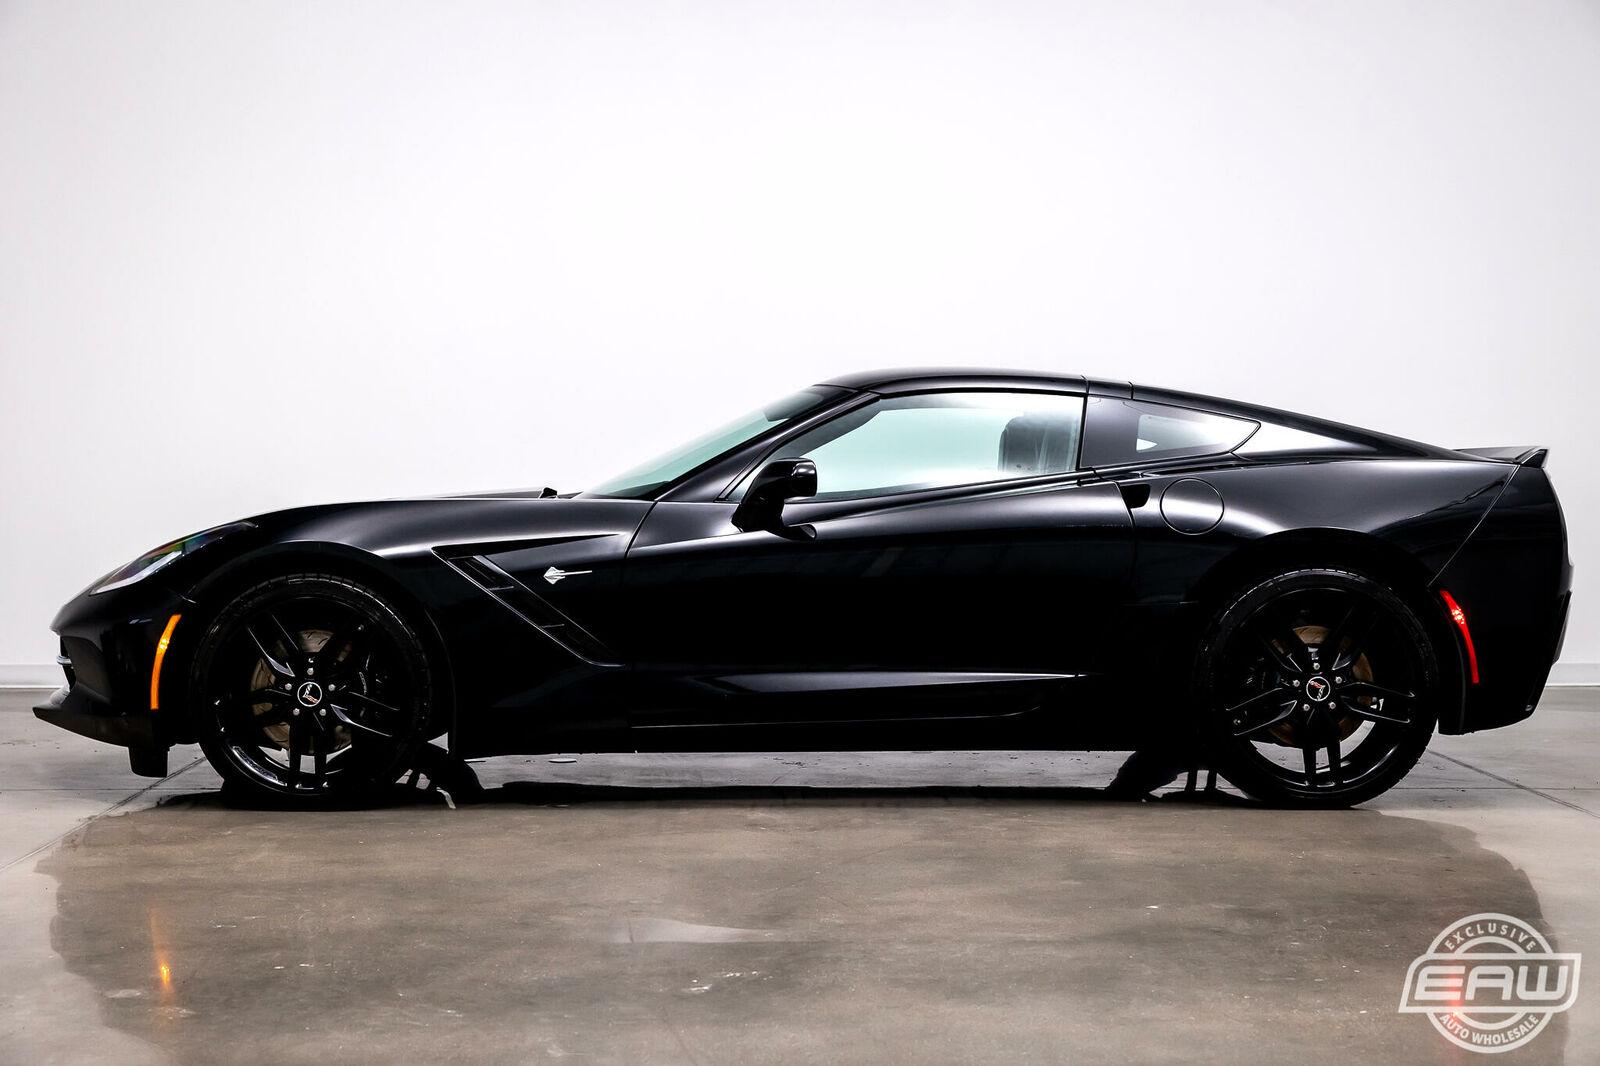 2014 Black Chevrolet Corvette Coupe 1LT | C7 Corvette Photo 6